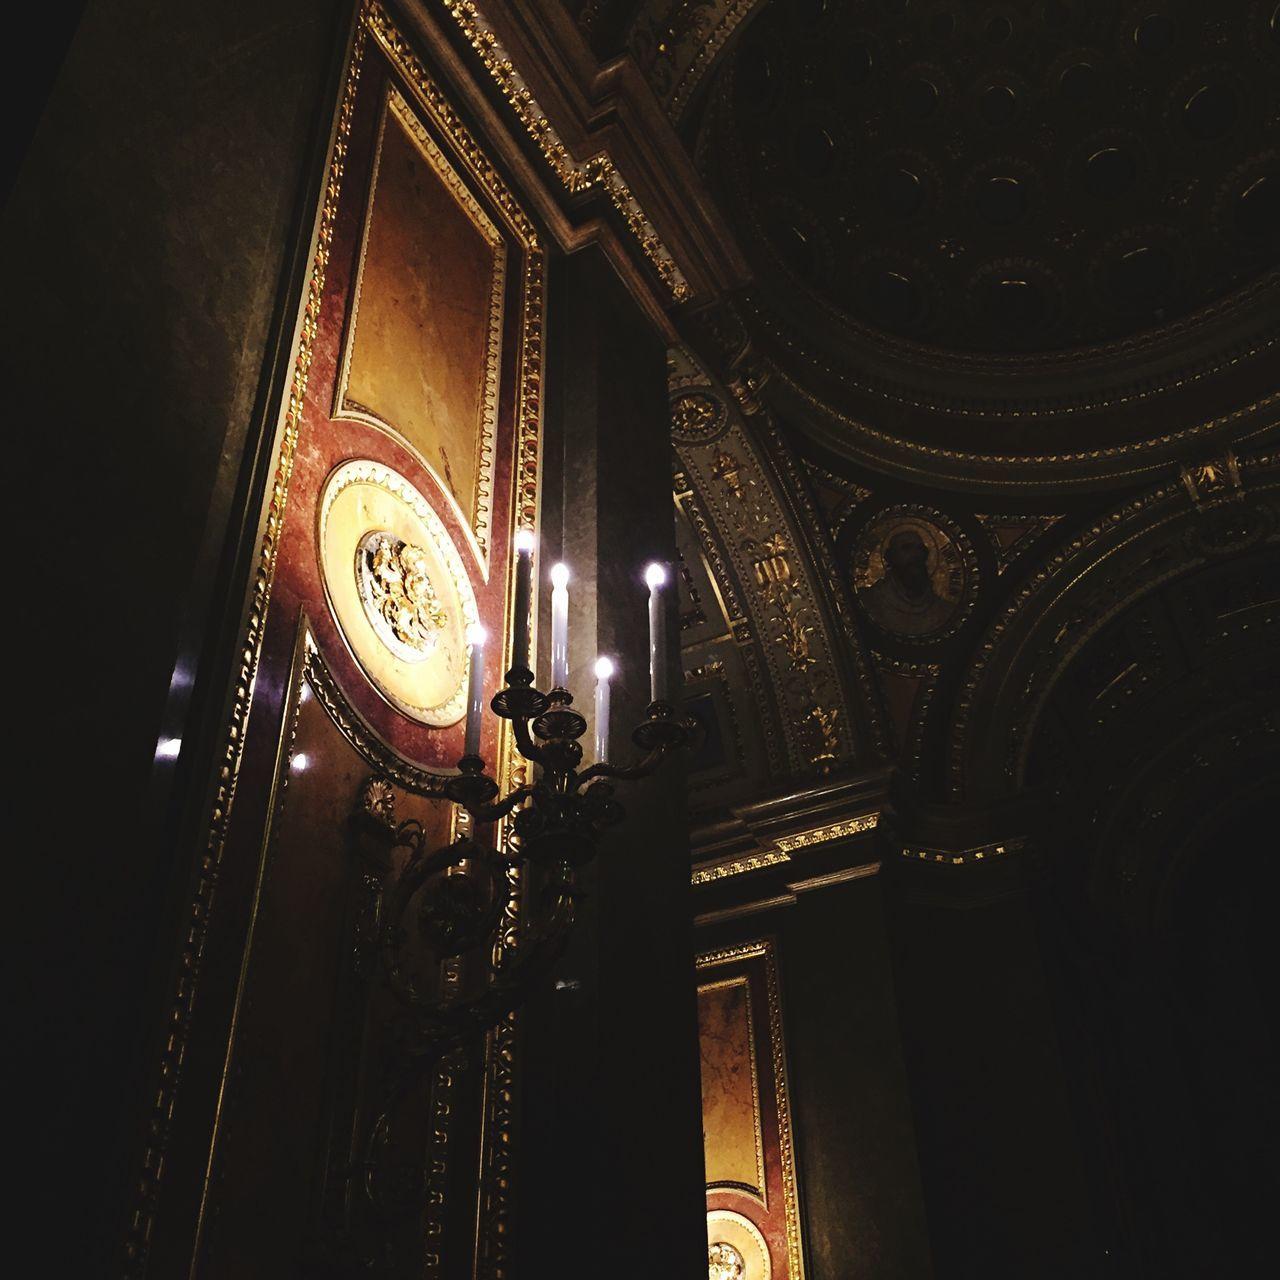 Candle 1800s Holy 1900s Church Silence Is Gold Silence Bohémien Art Artistic Hungary Budapest